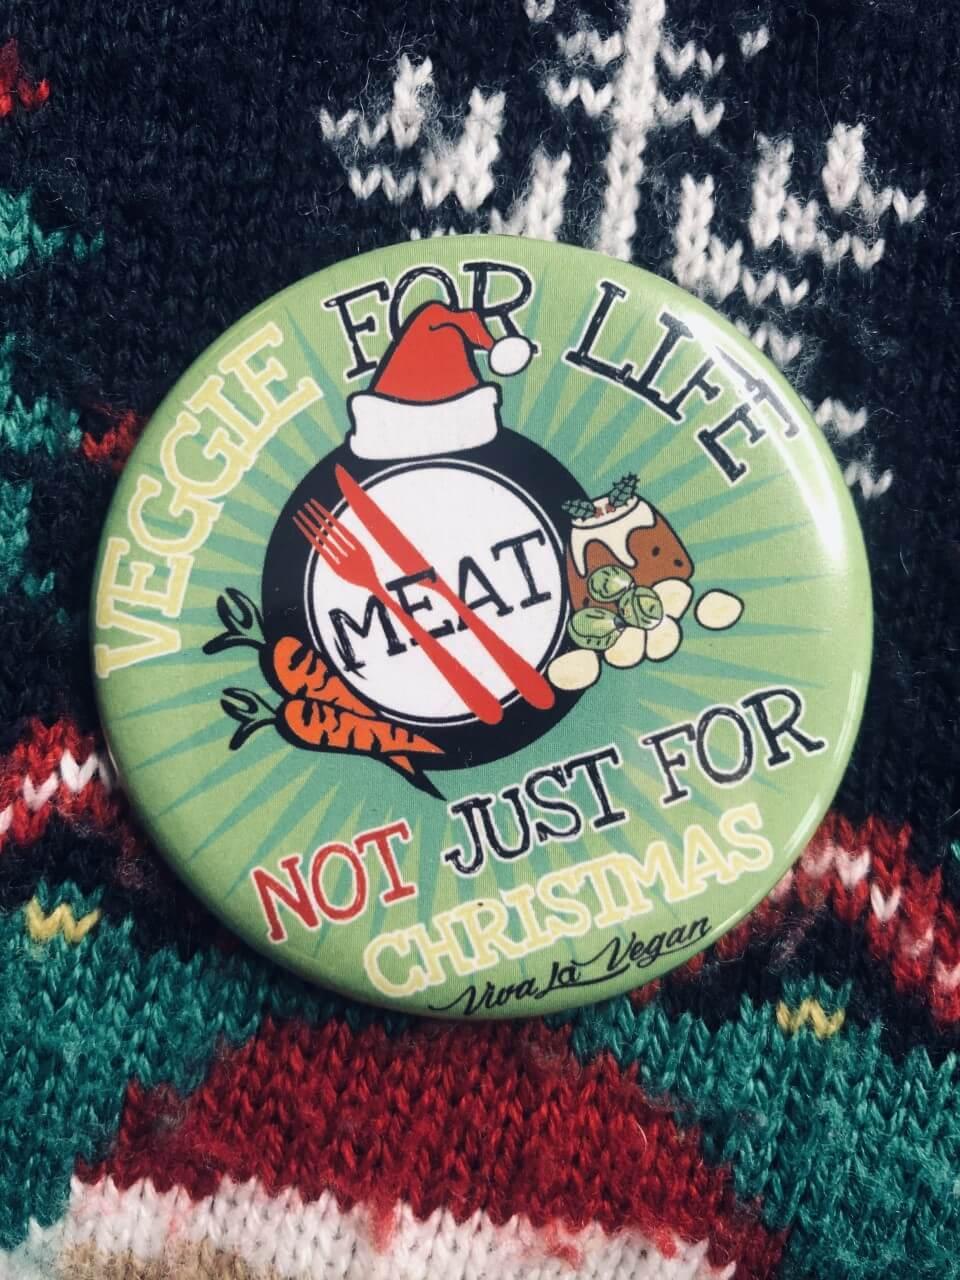 58mm Statement Badge: Xmas Veggie For Life by eco ethical brand Viva La Vegan